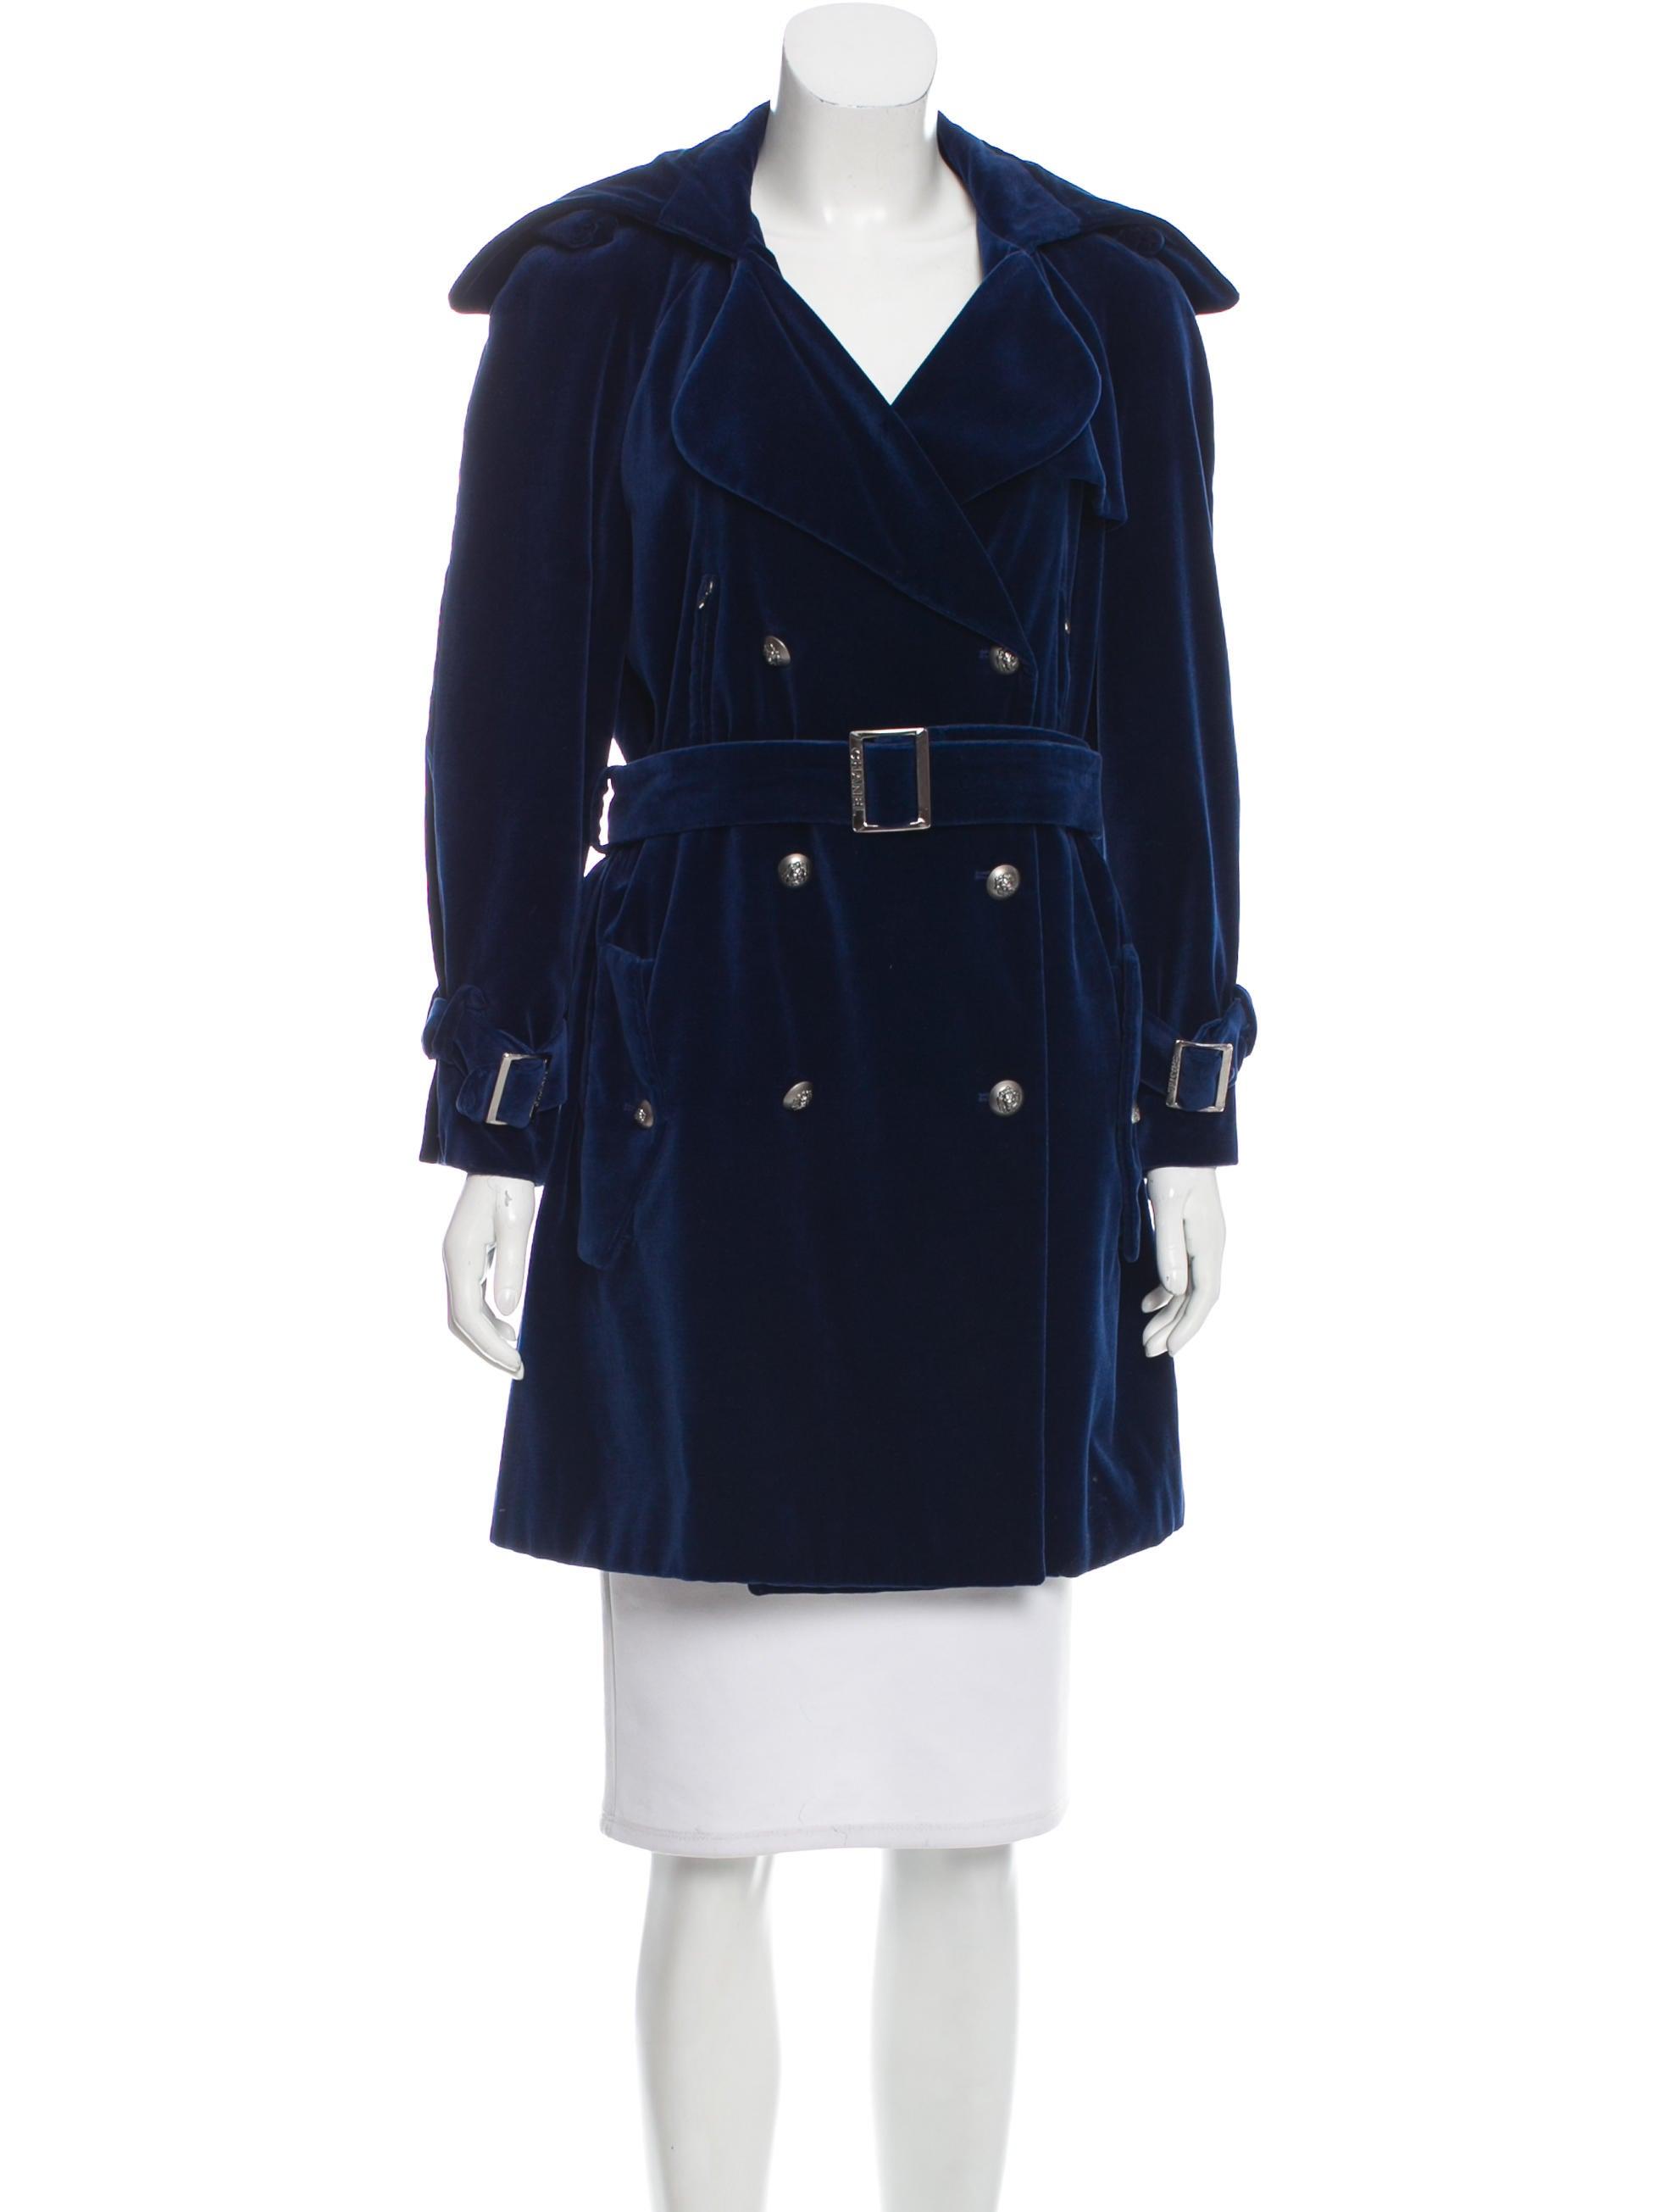 Chanel Velvet Double Breasted Coat Clothing Cha178598